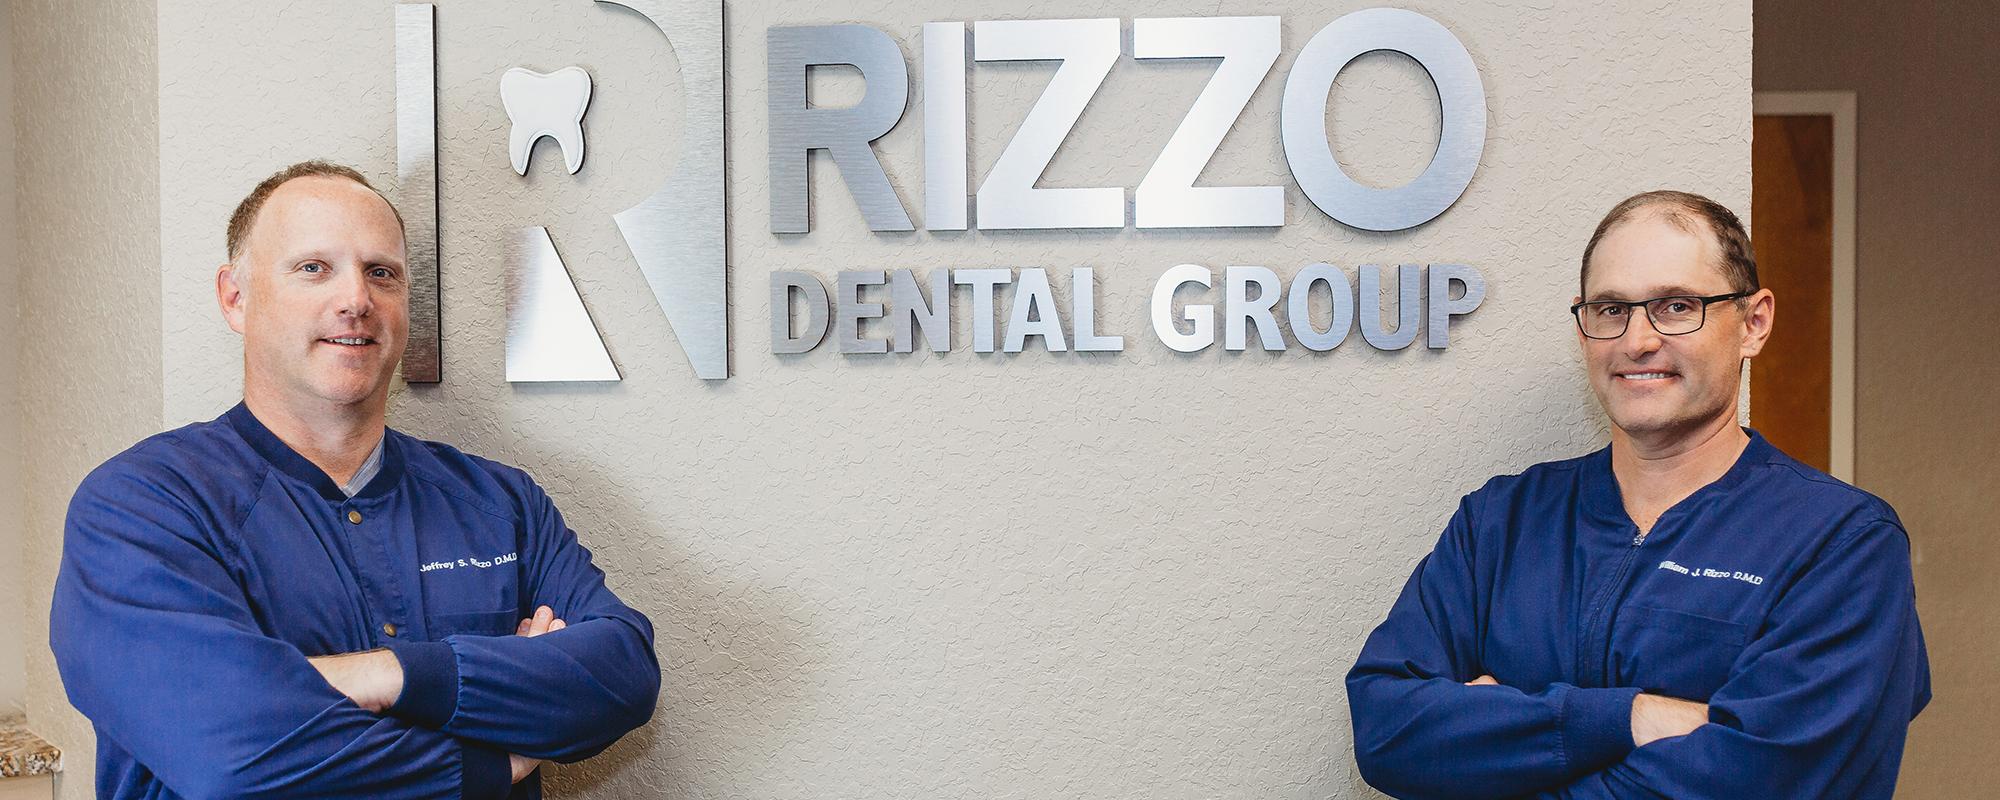 Rizzo Dental Group